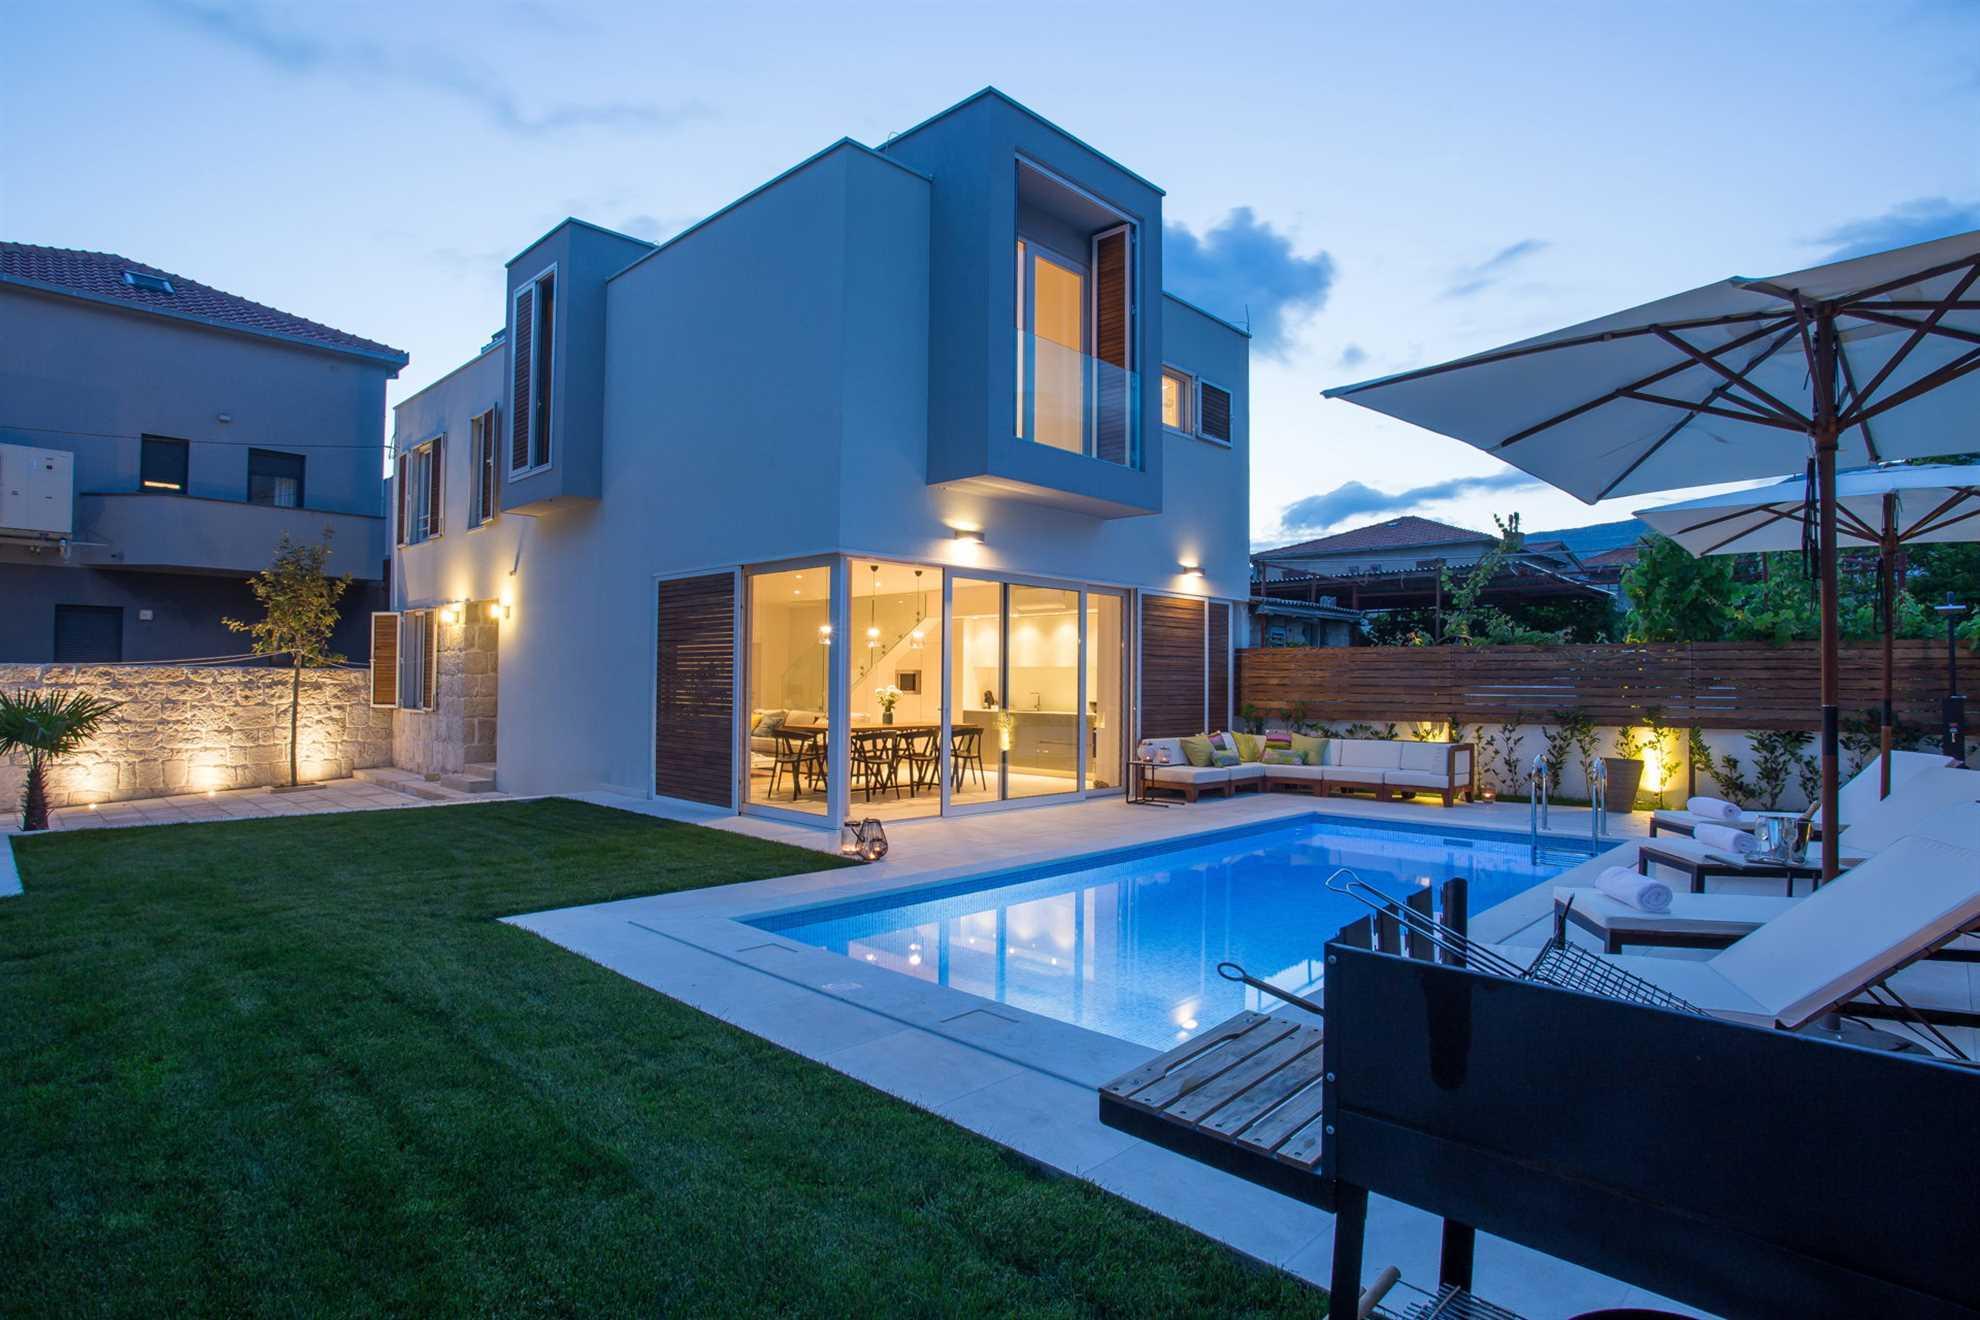 Villa La Idea with Heated Pool